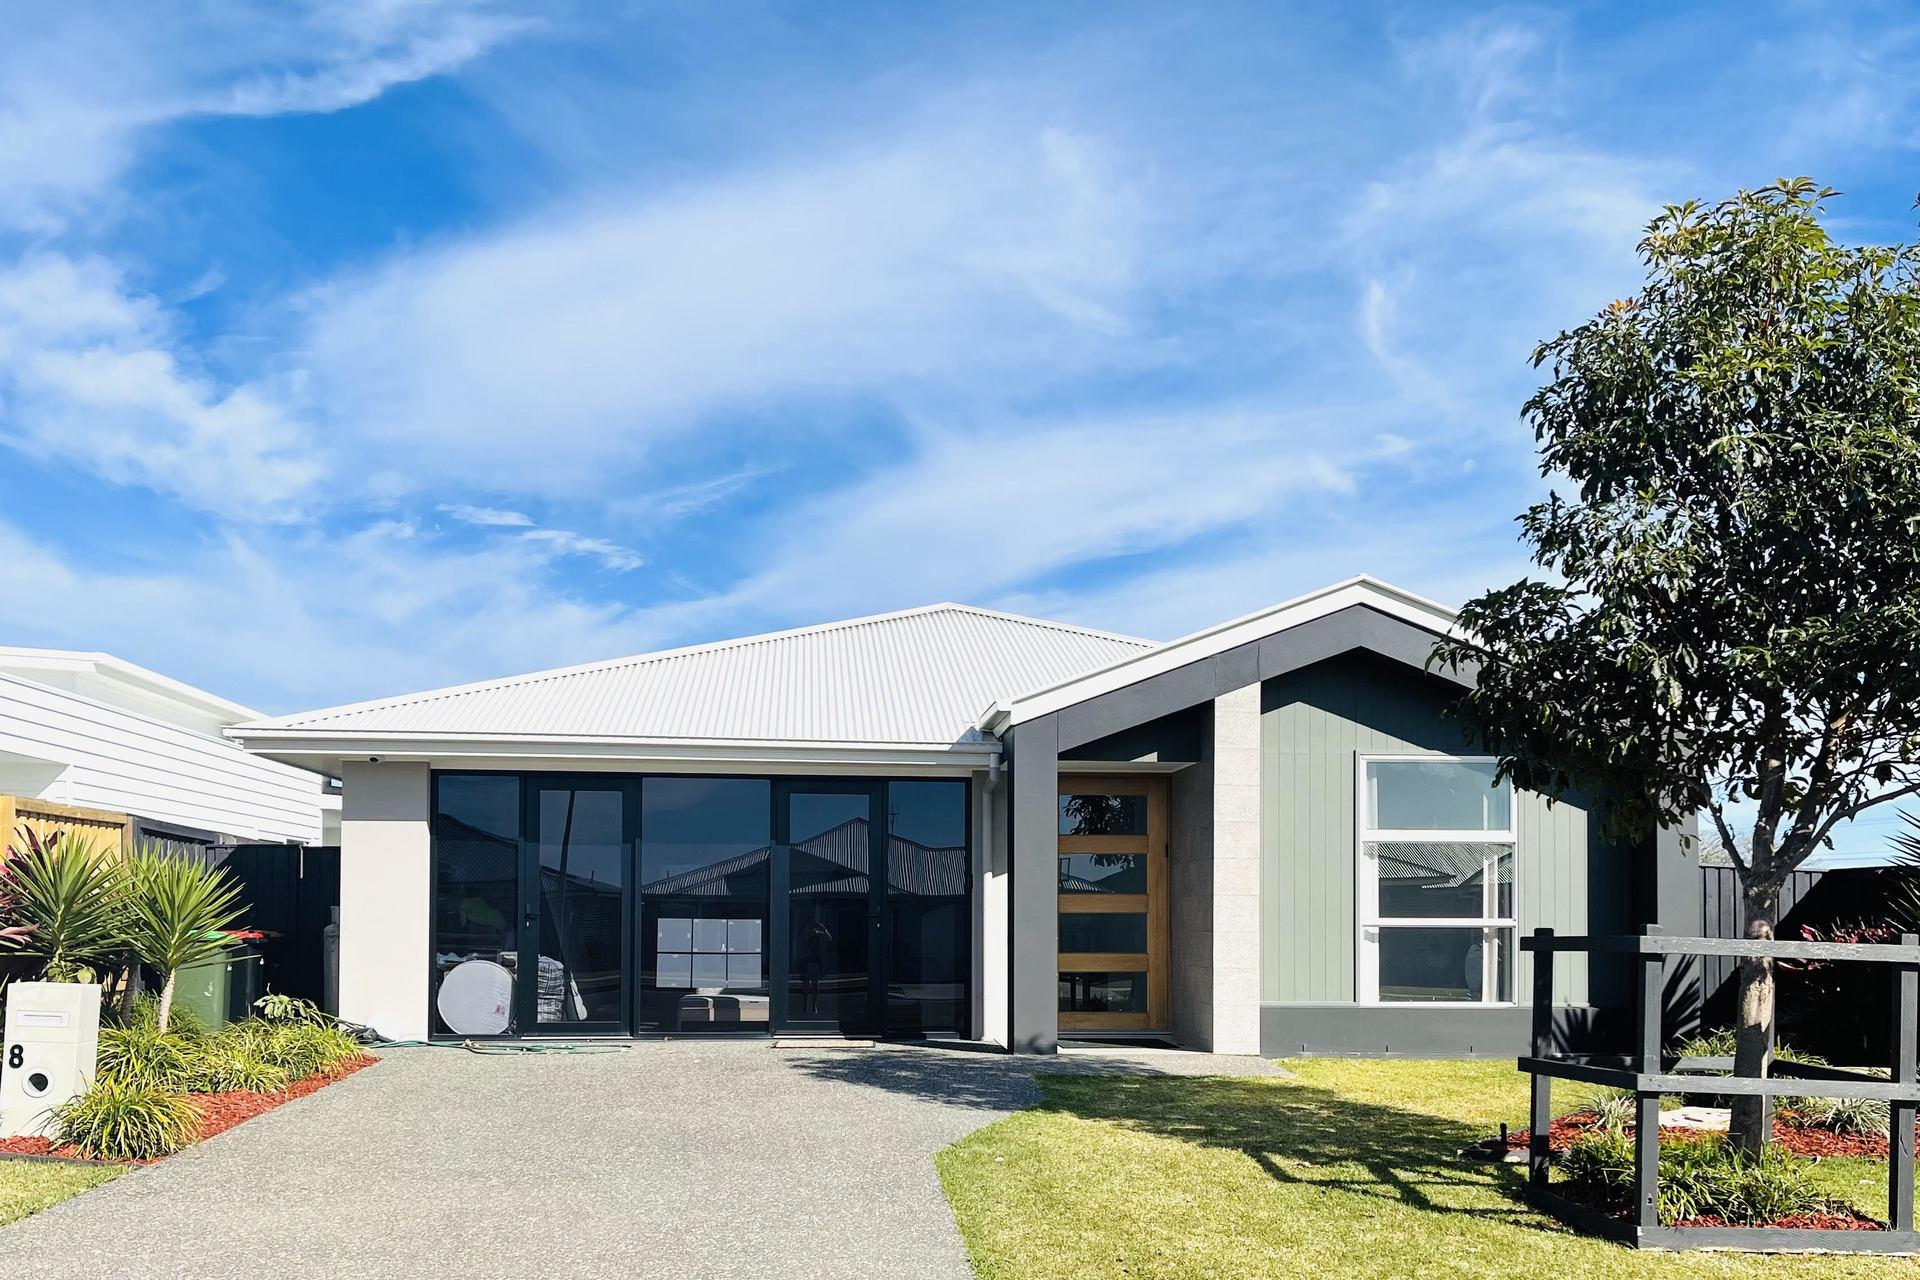 8 Seaside Drive, Lake Cathie, NSW, 2445 - Image 1